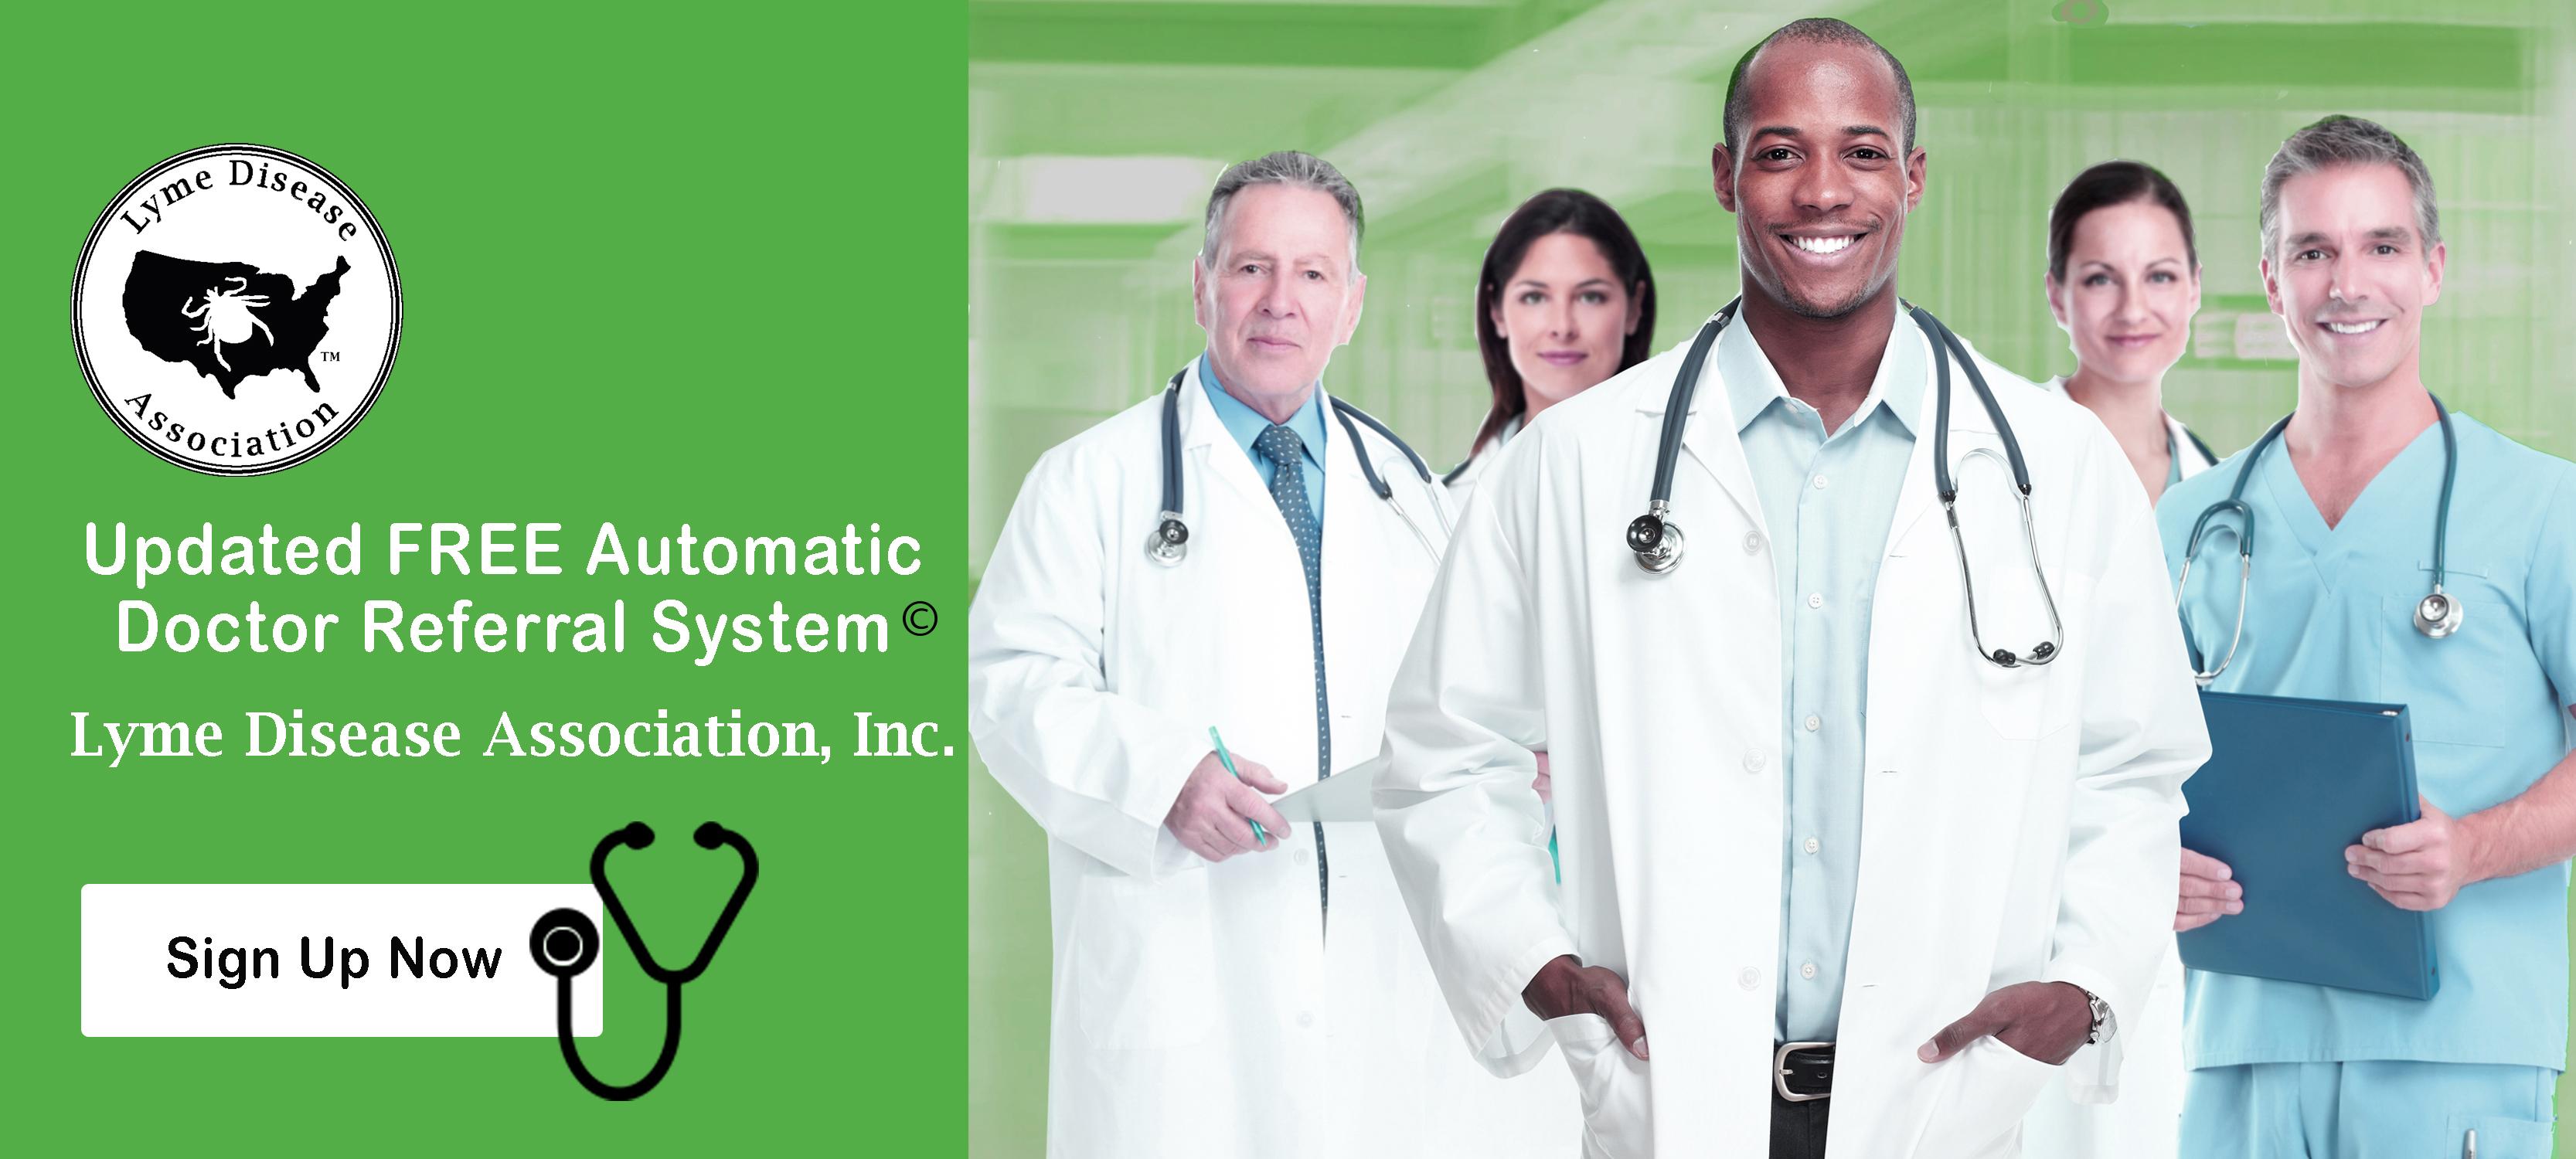 Dr Referral Image